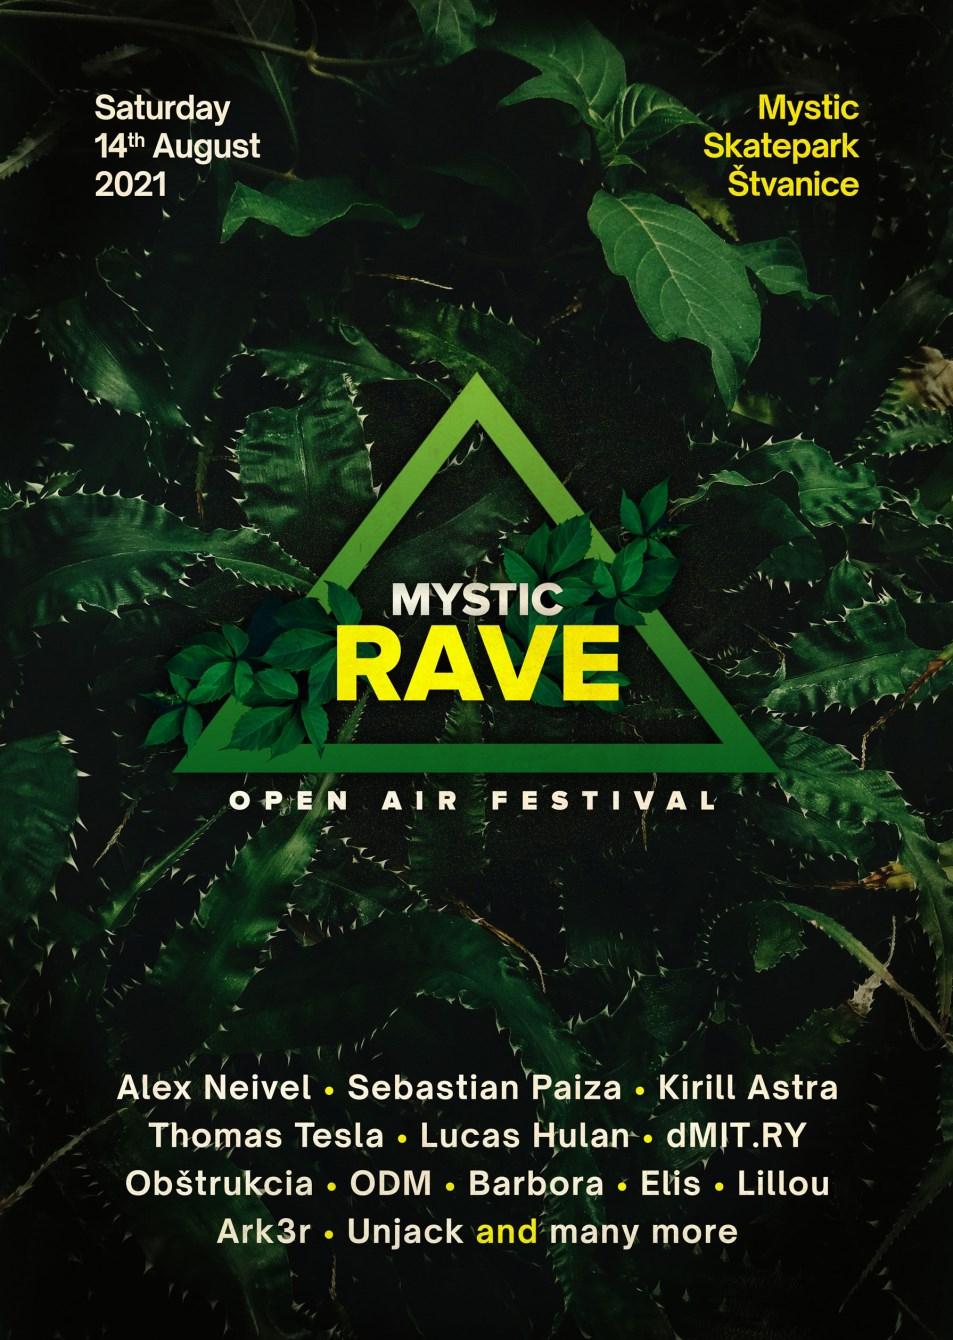 Mystic Rave 2021 - Flyer front